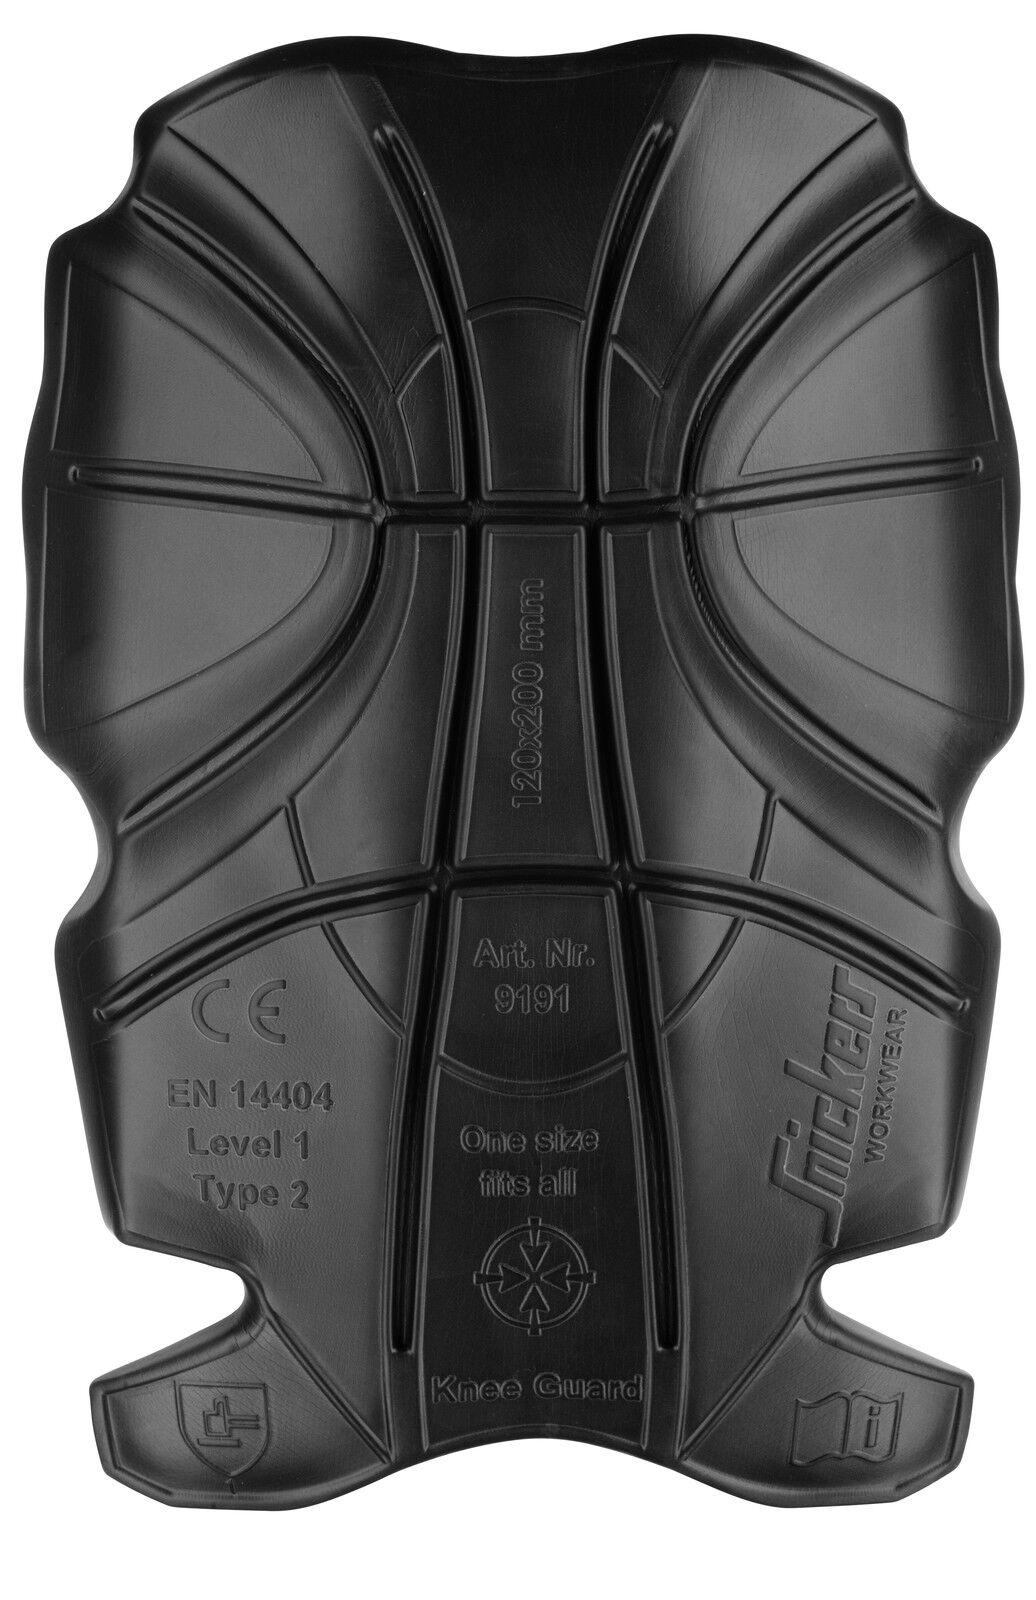 Snickers Arbietskleidung 9191 XTR D3O Kniepolster Snickers direkt